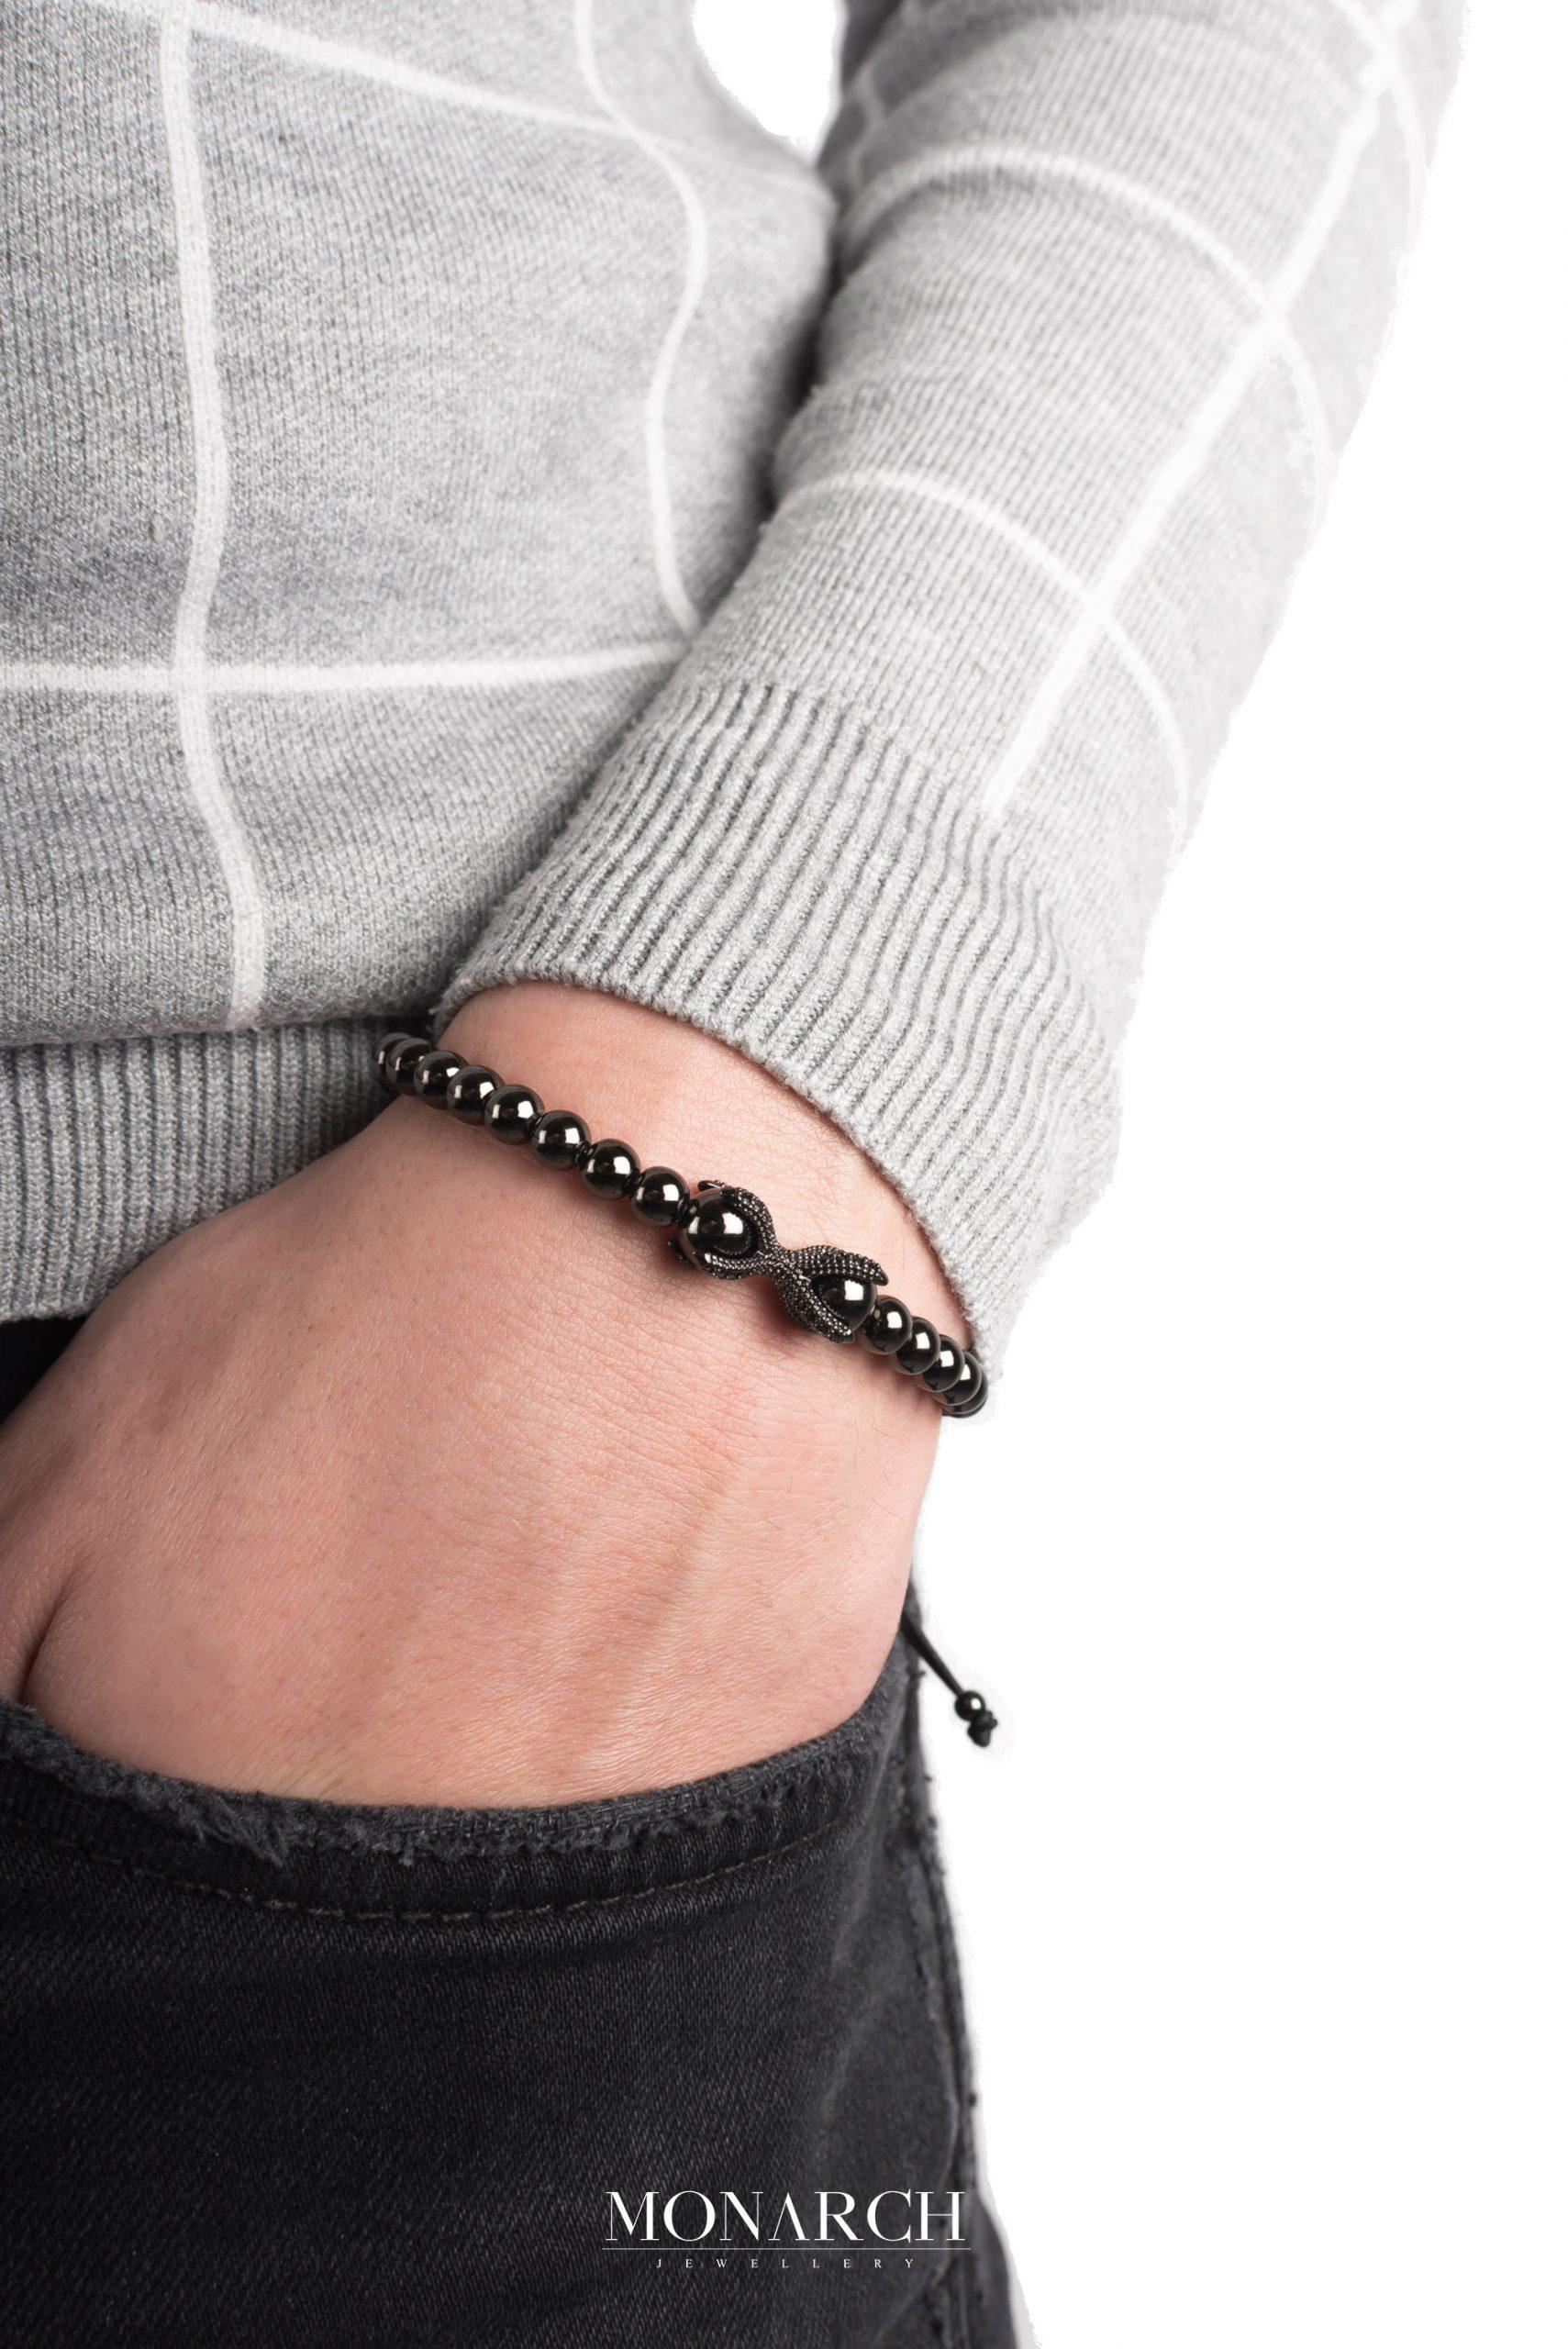 black luxury bracelet for man, monarch jewellery MA146NNB